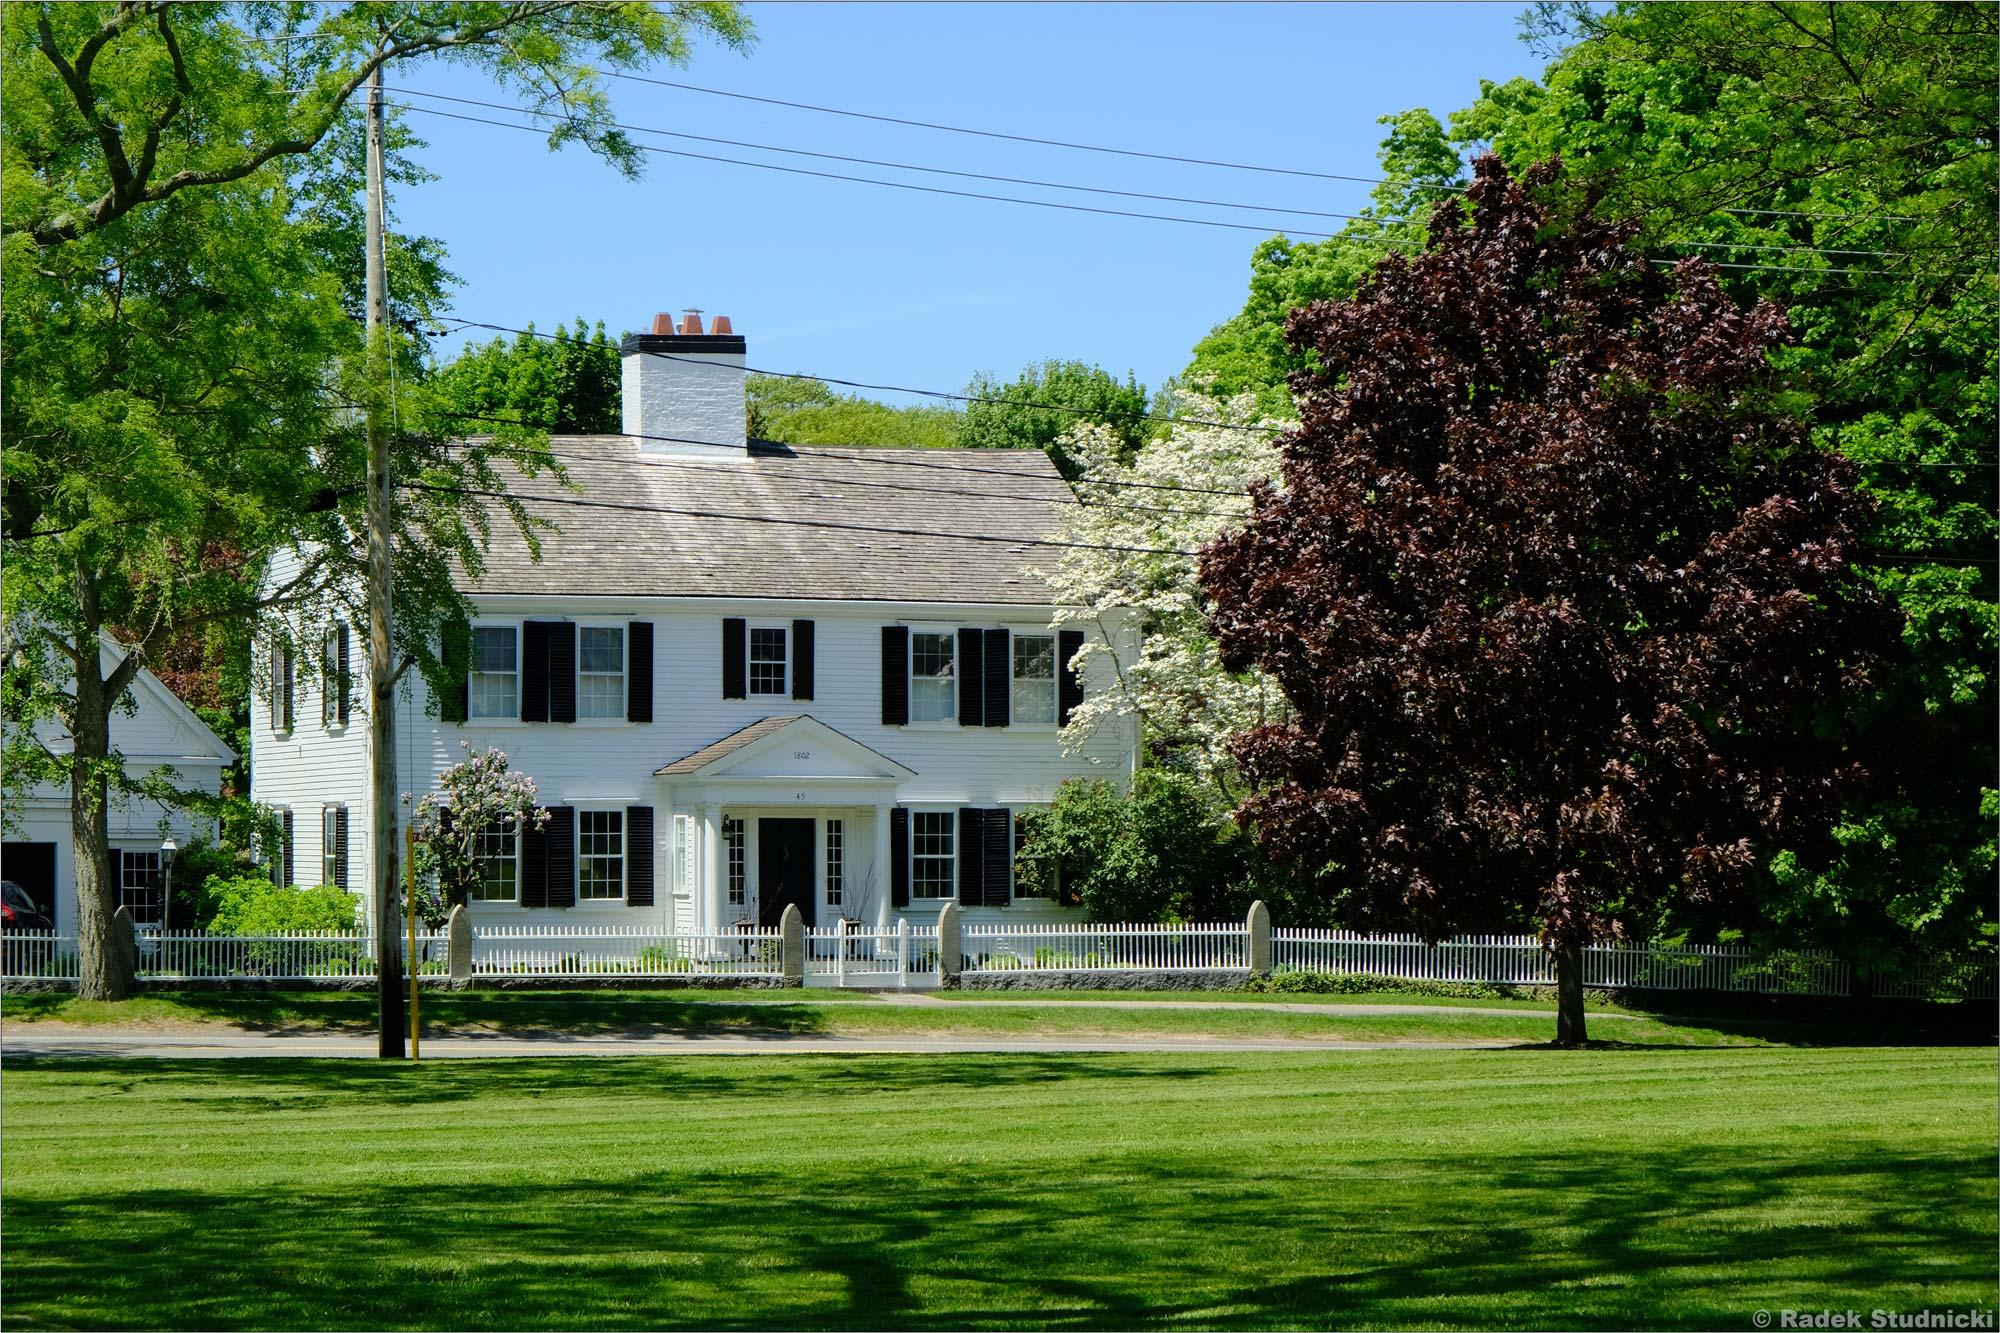 Cohasset, Massachusetts